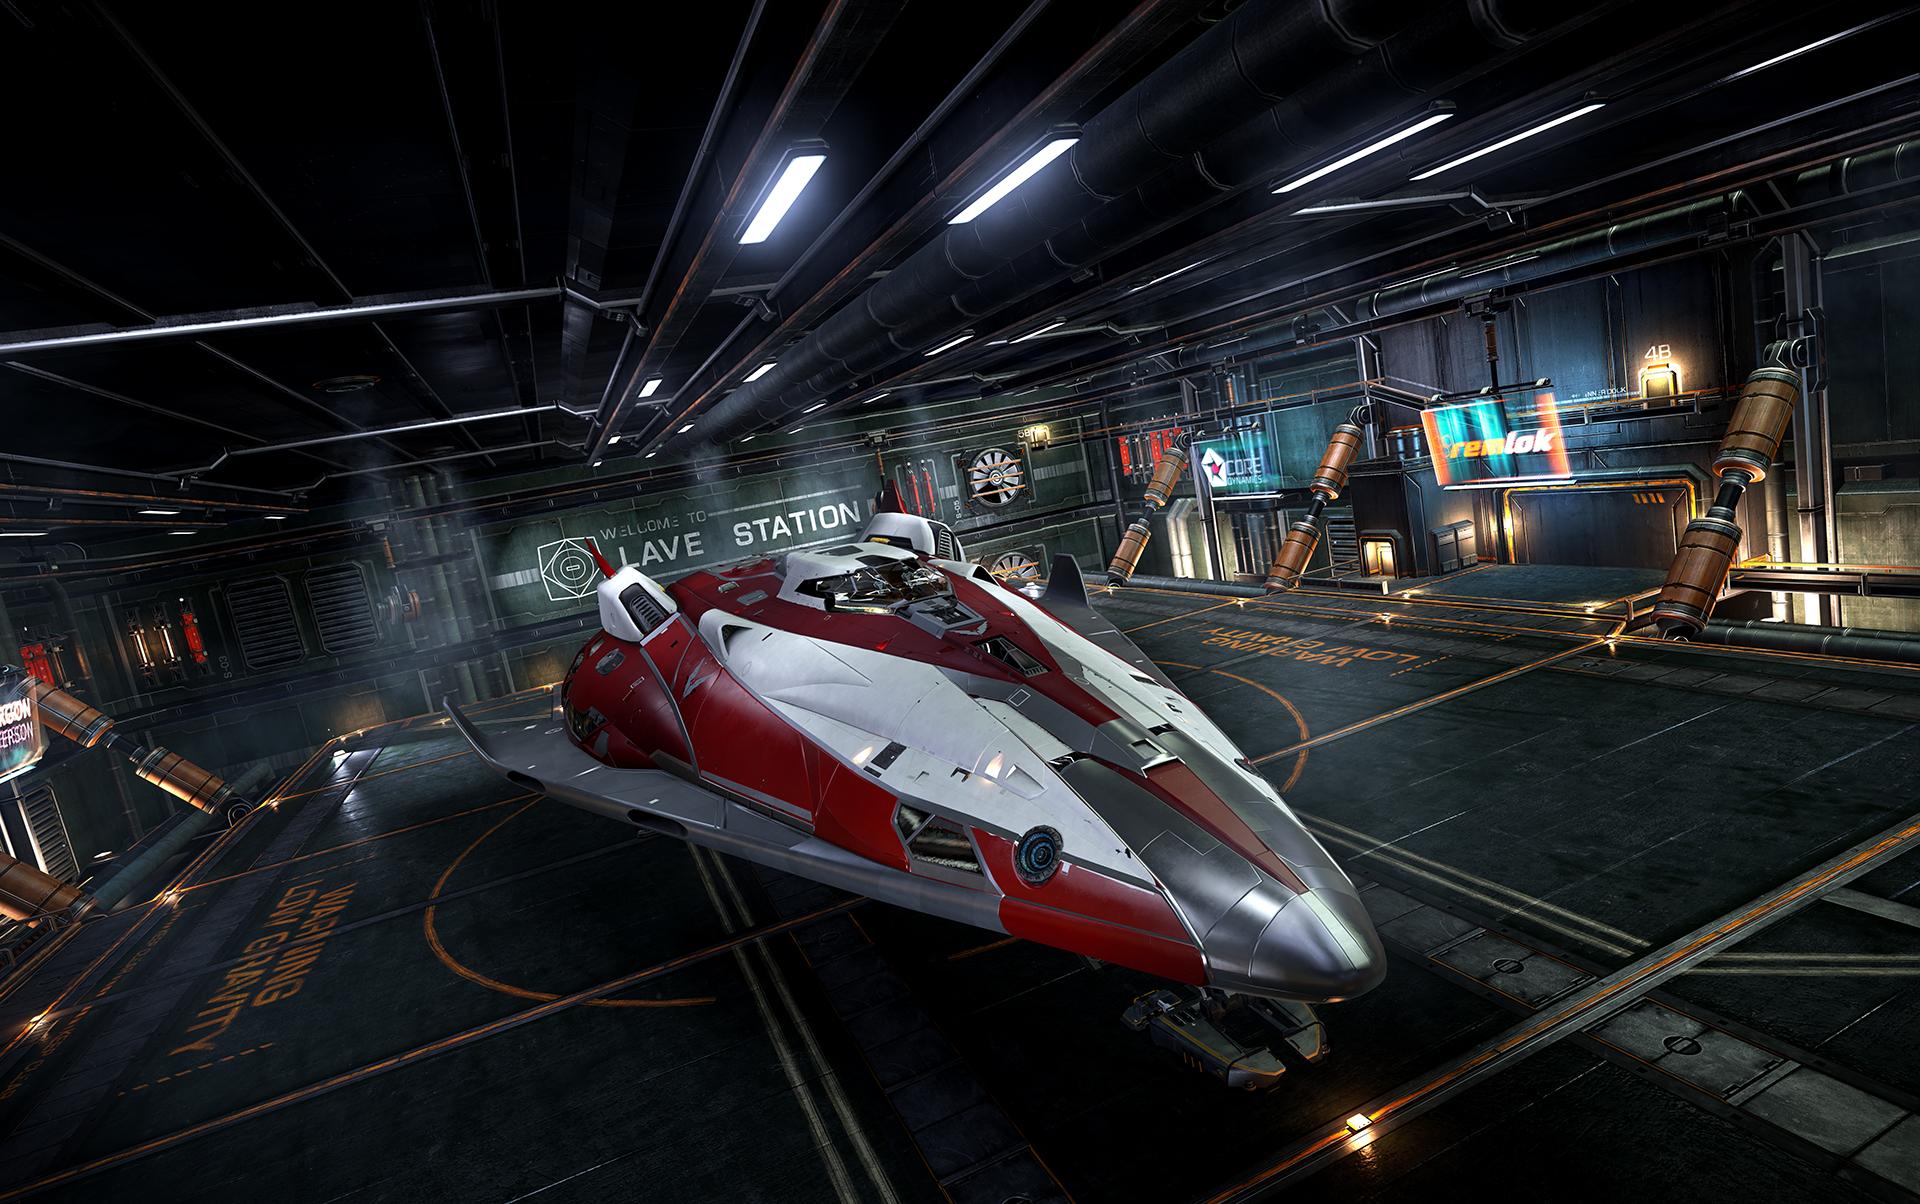 Elite: Dangerous Race to Elite winners announced, one player